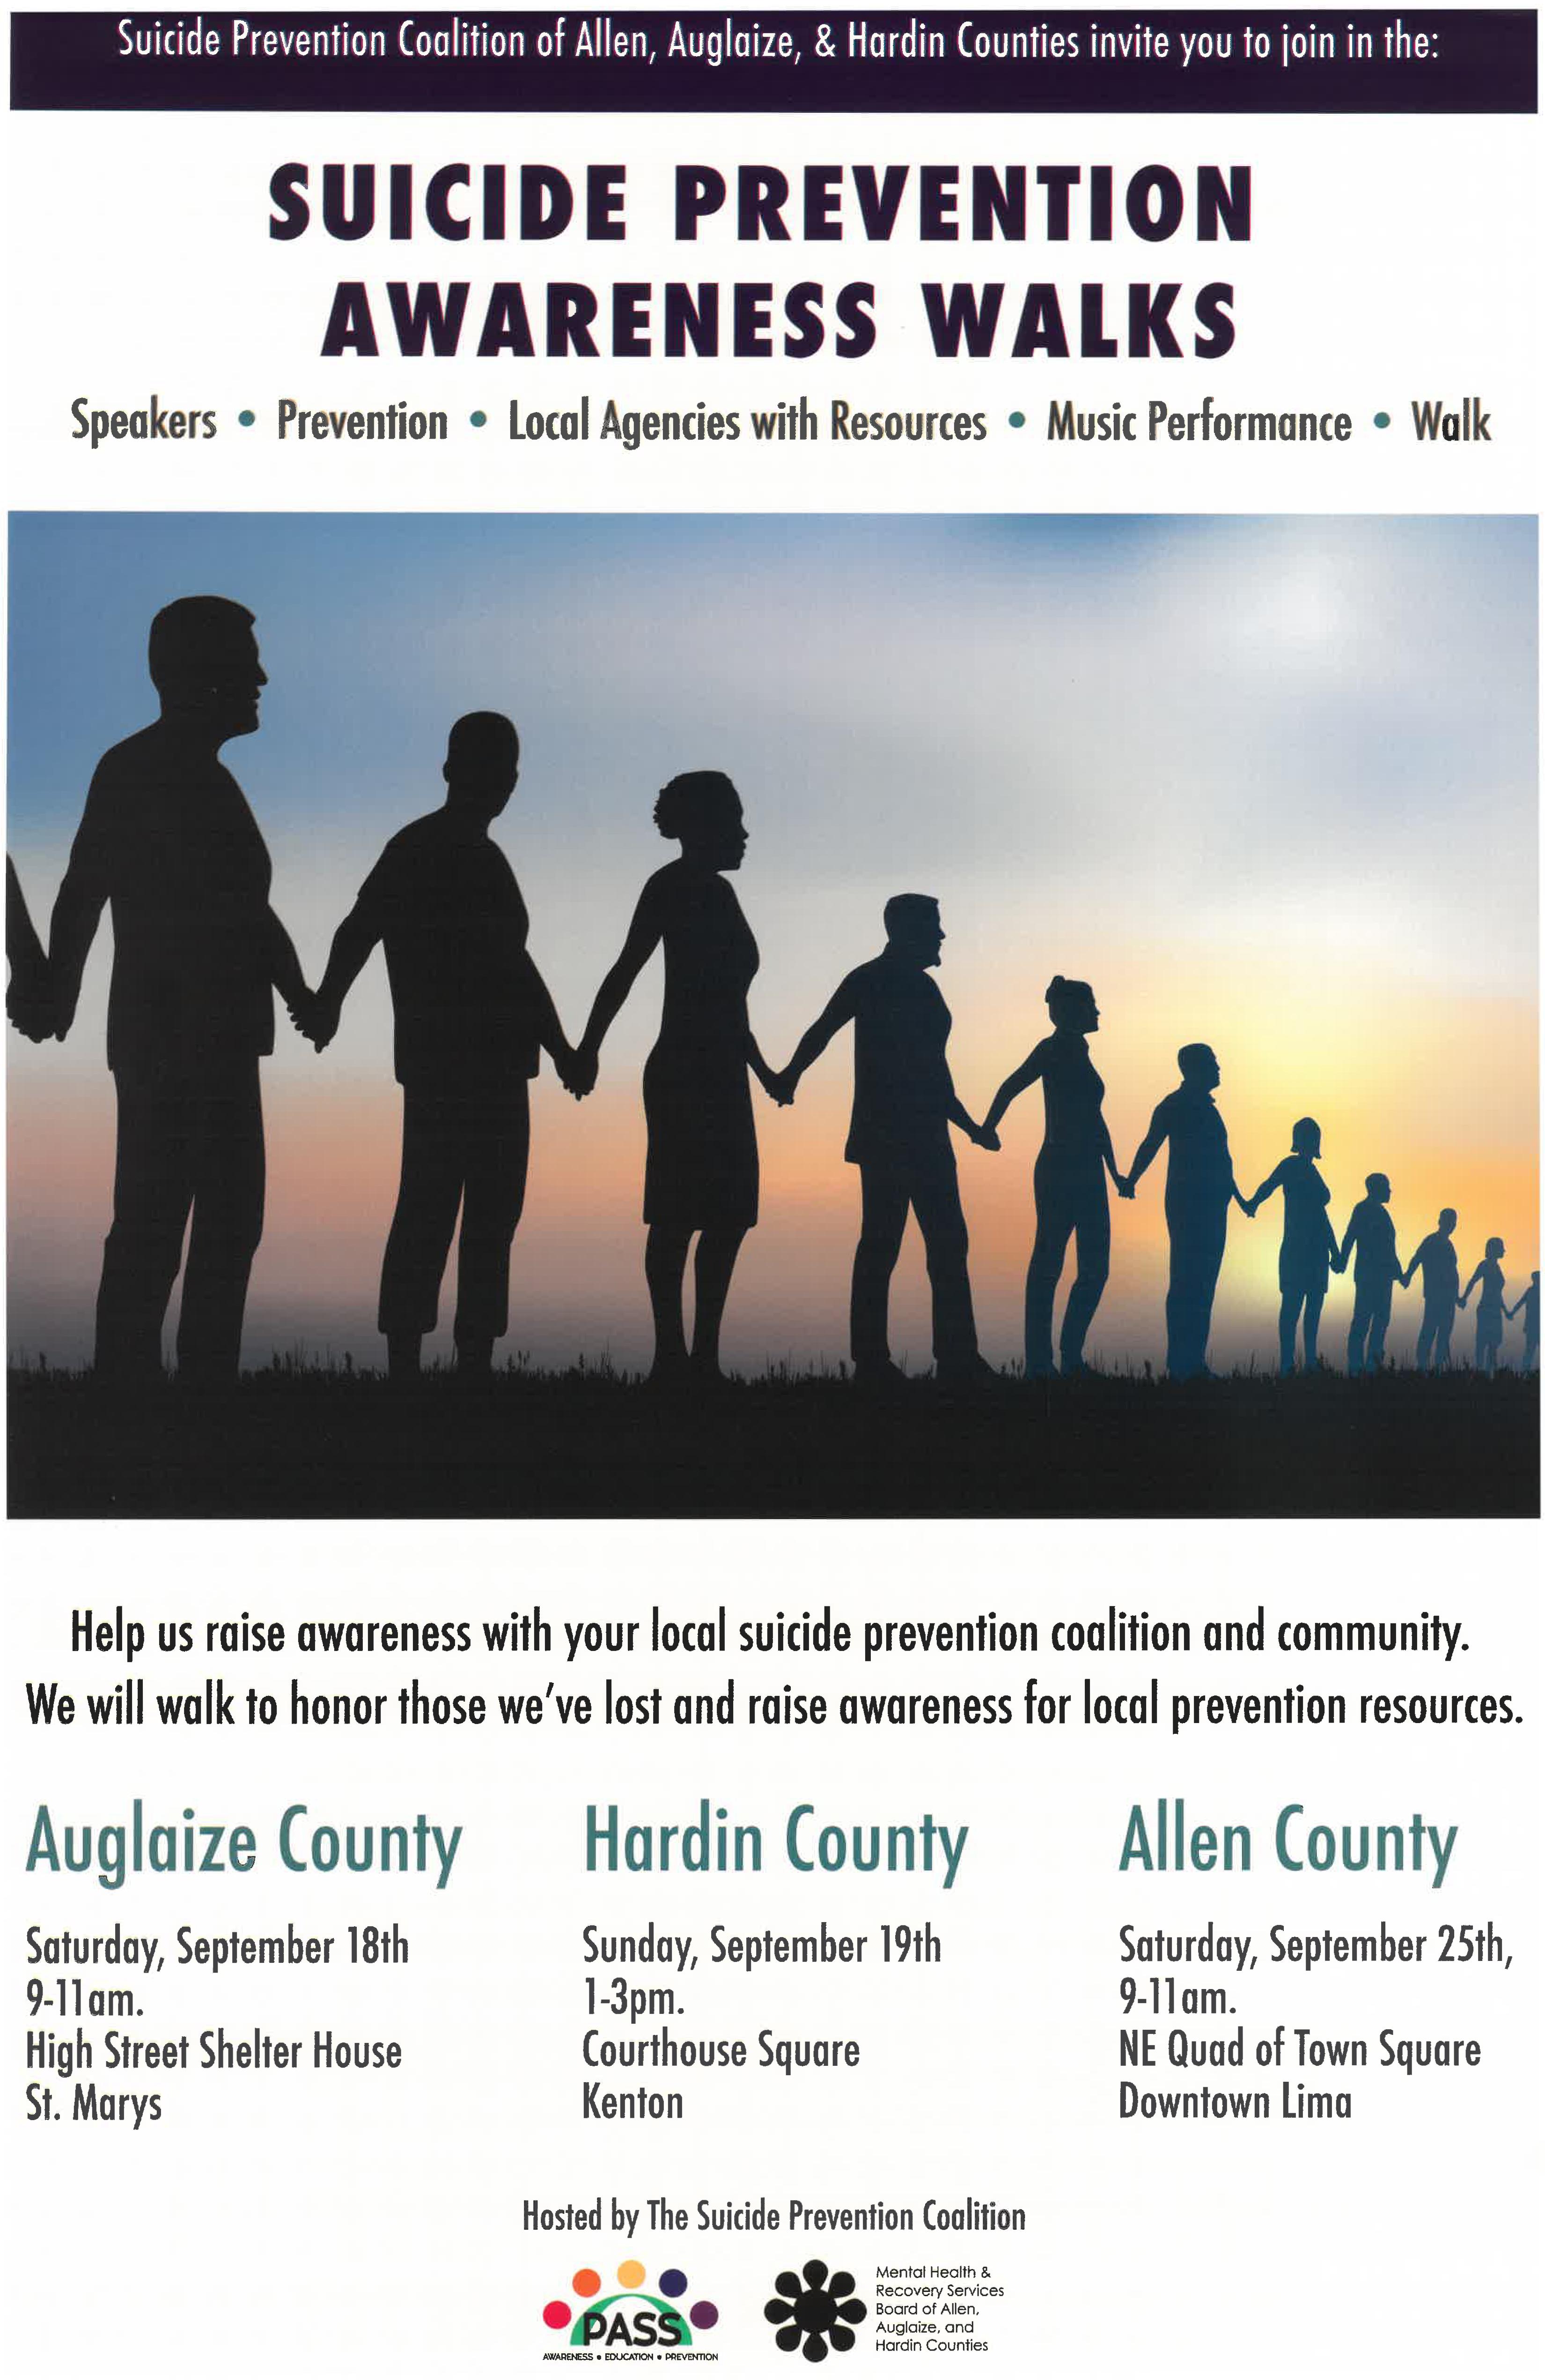 Suicide Prevention Awareness Walks